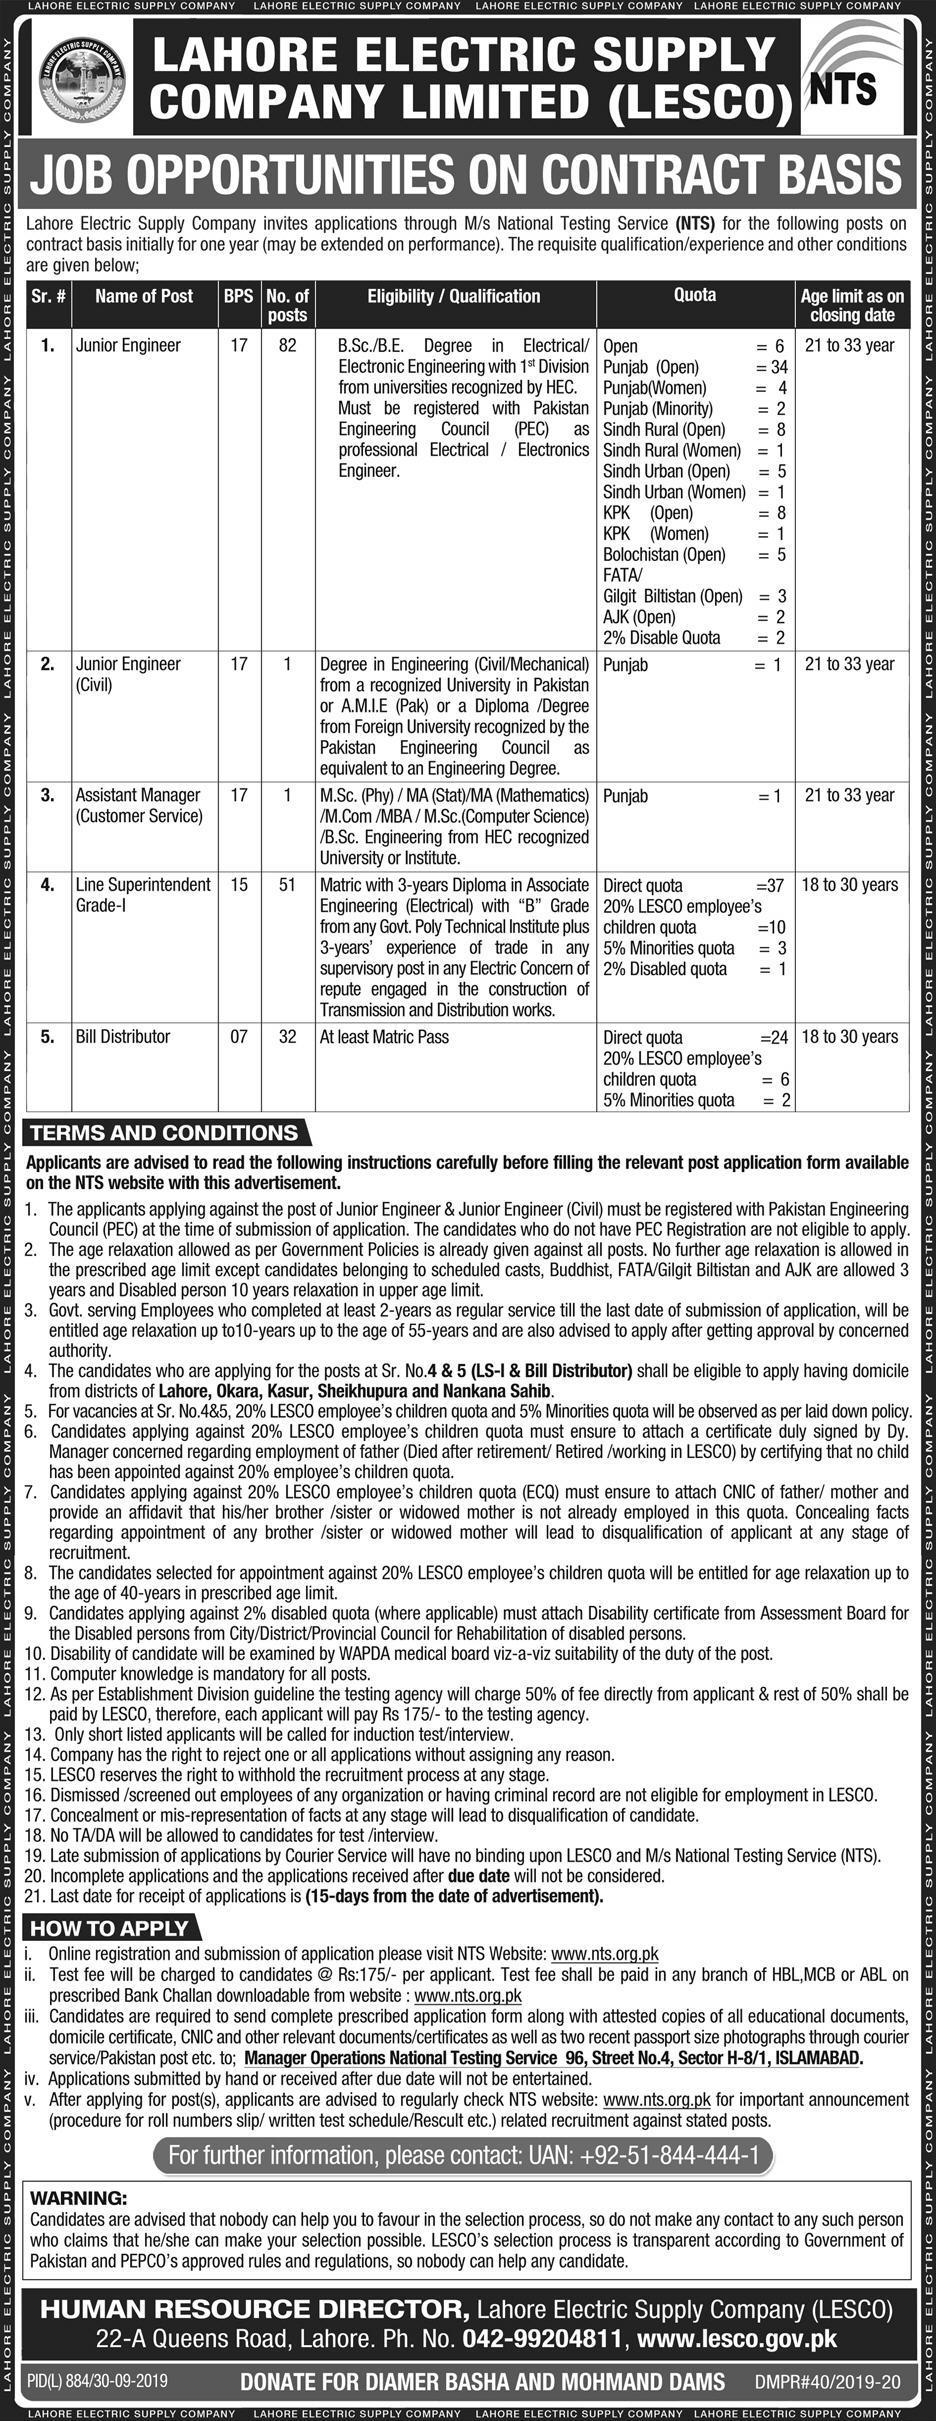 LESCO Lahore Electric Supply Company NTS Jobs 2019 Application Form Roll No Slip